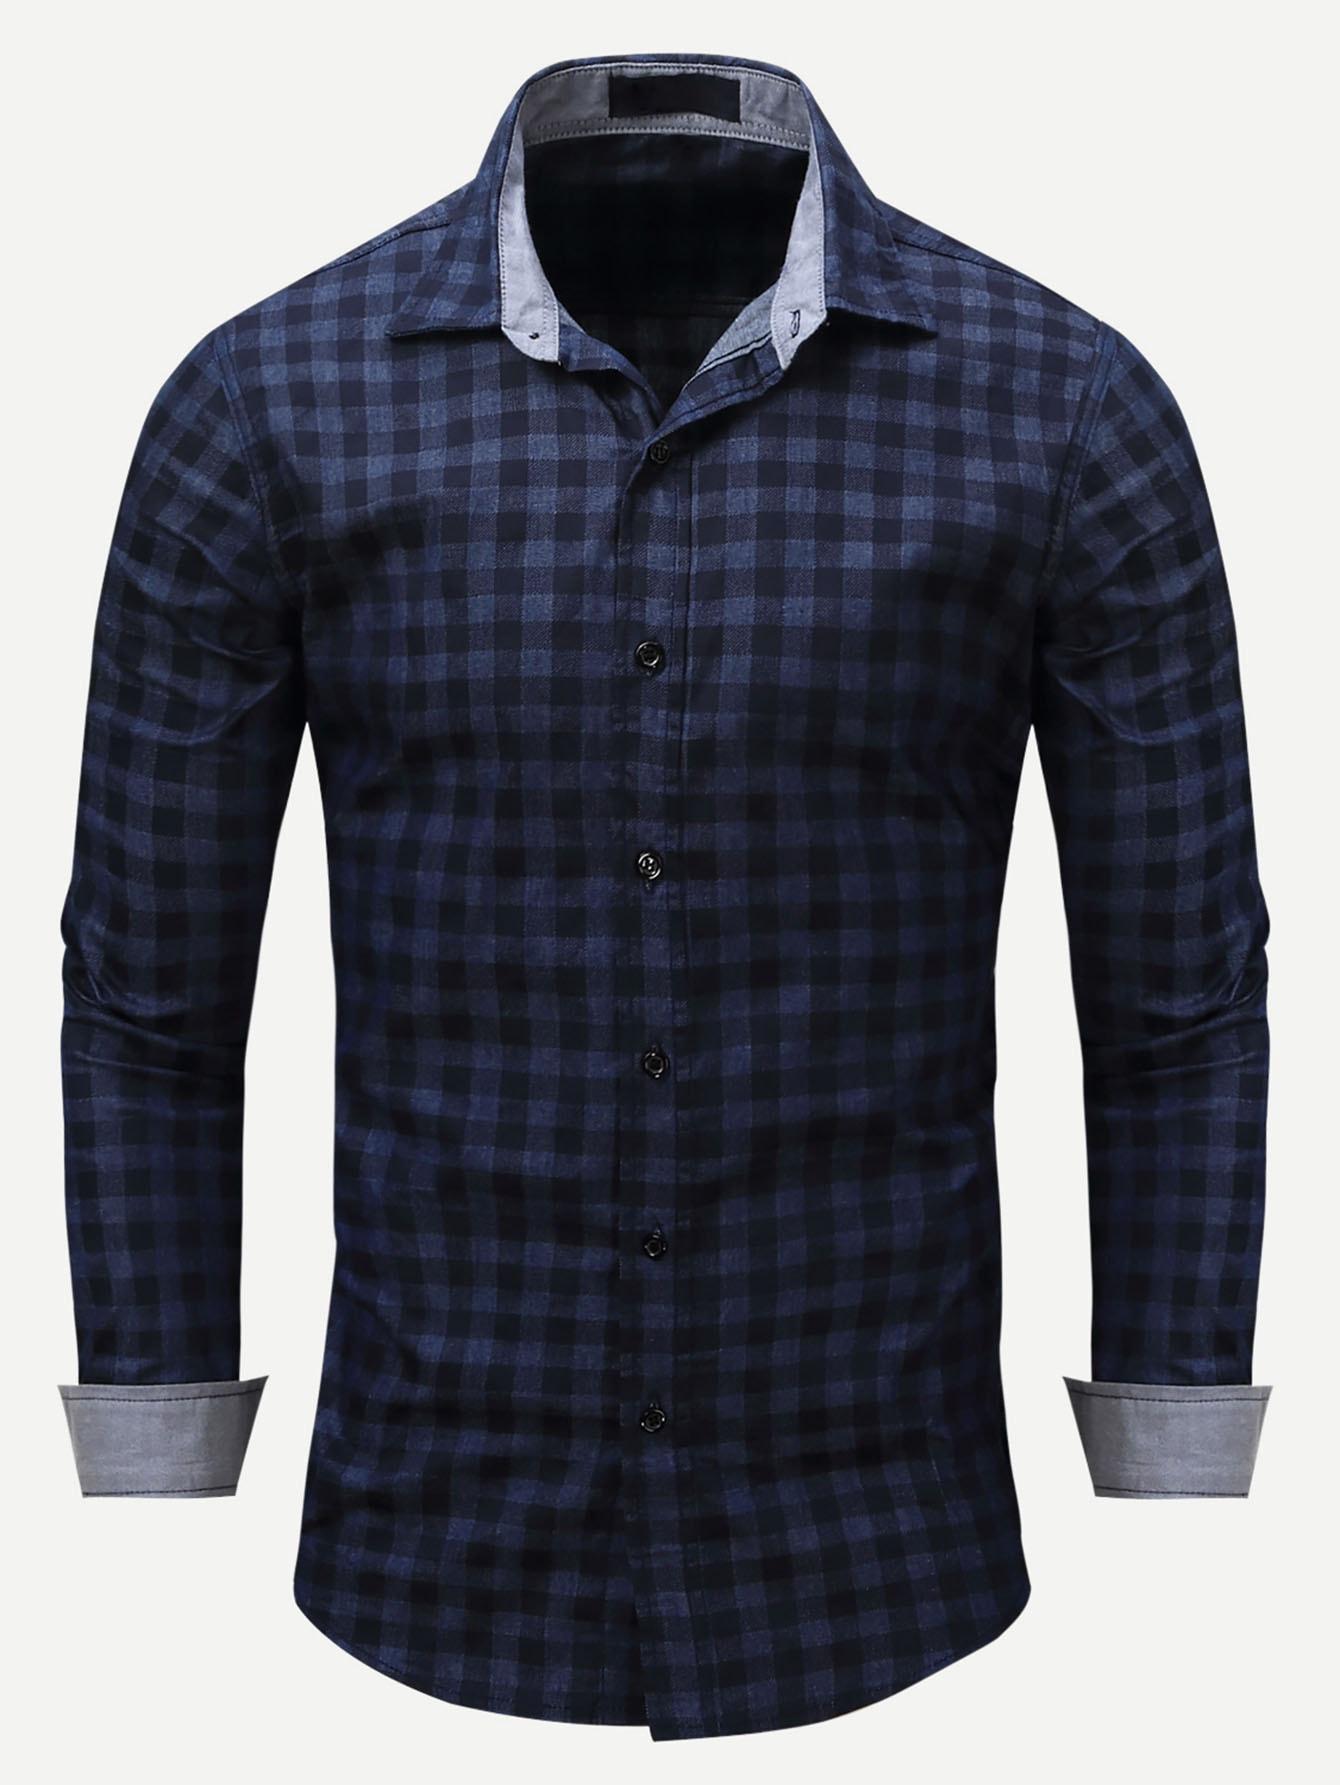 Men Plaid Collar Denim Shirt Men Plaid Collar Denim Shirt